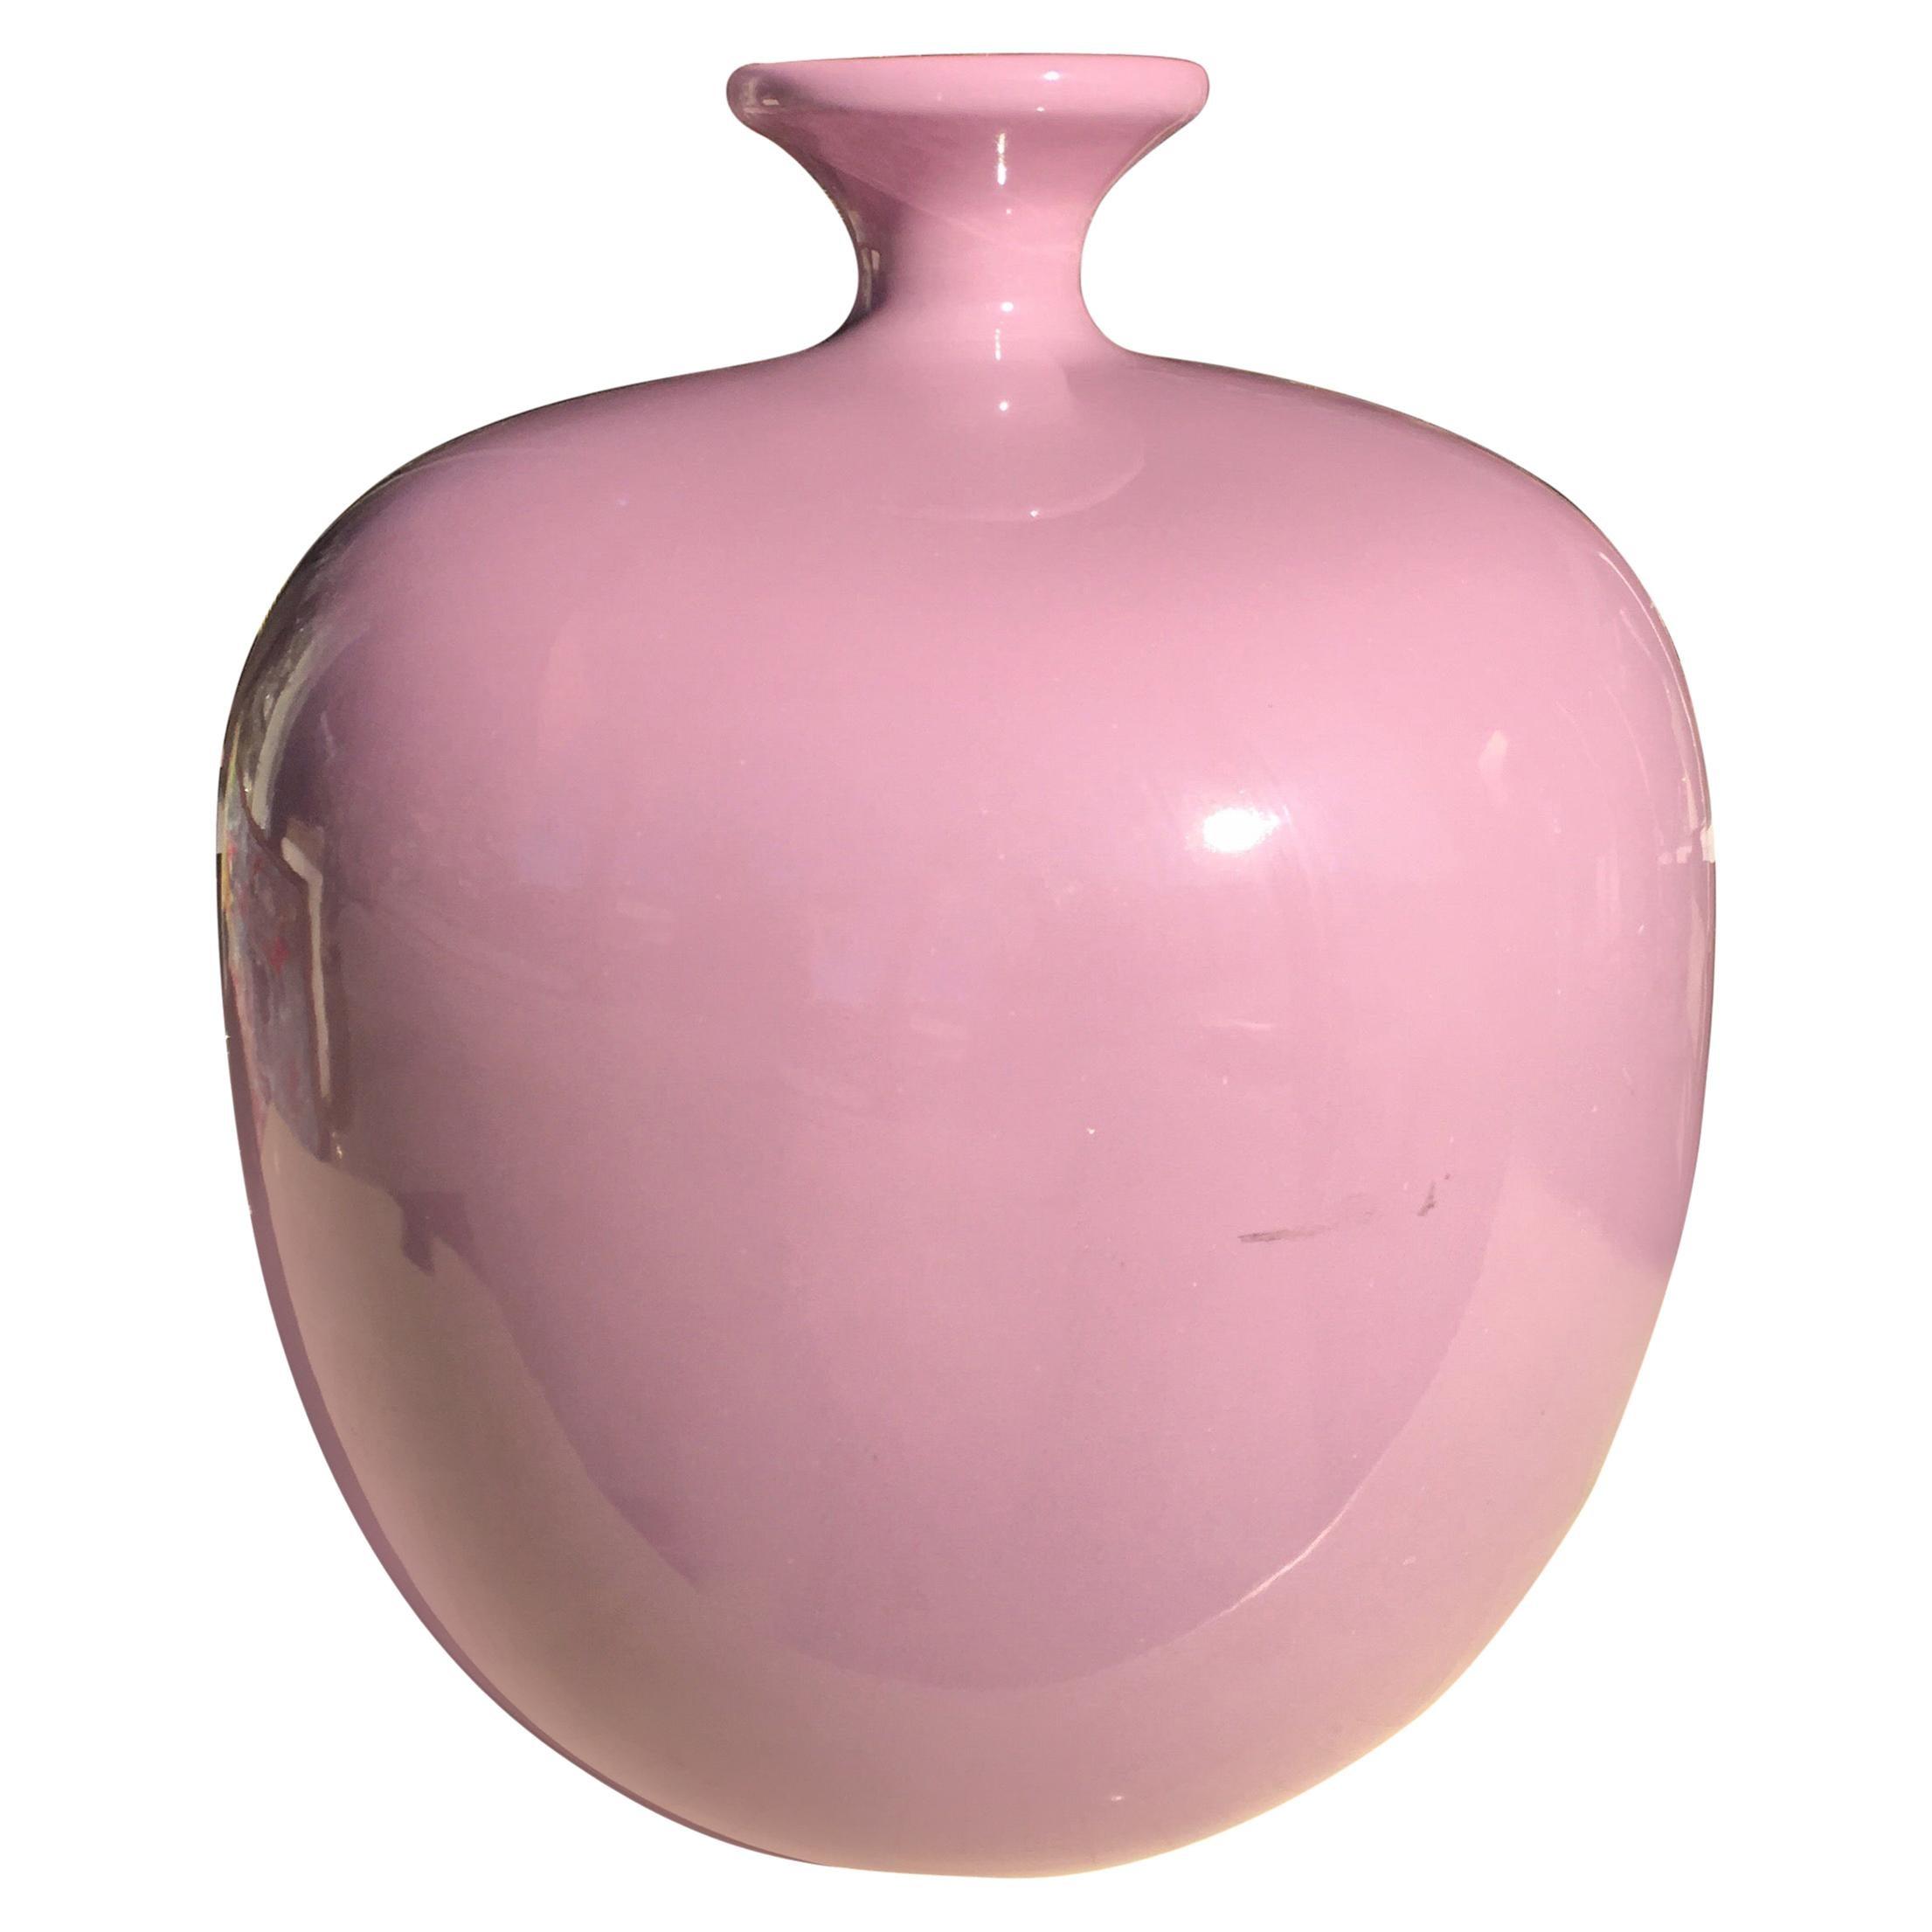 Large Vintage 1980s Sculptured Jaru Ceramic Vase